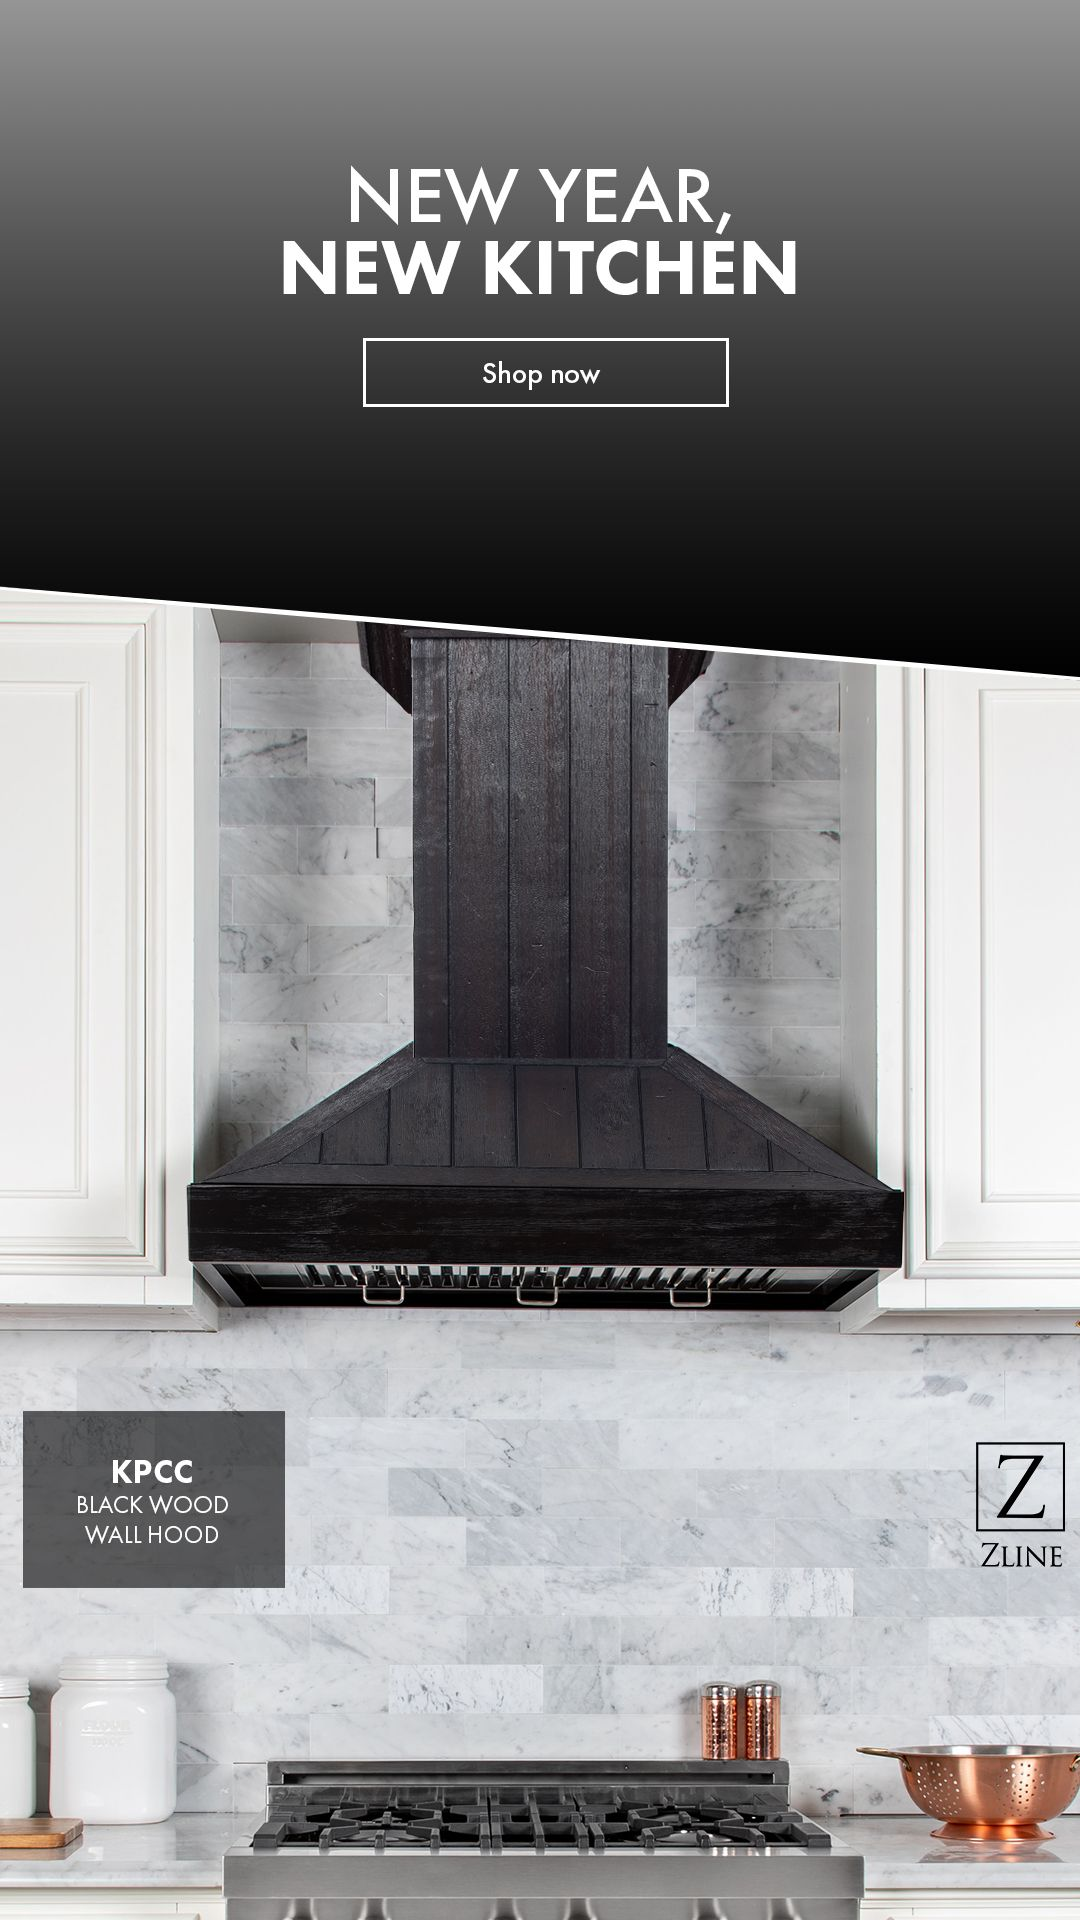 Exclusive Retailer For Zline Kitchen Products Wooden Range Hood Black Stainless Range Hood Wood Range Hood